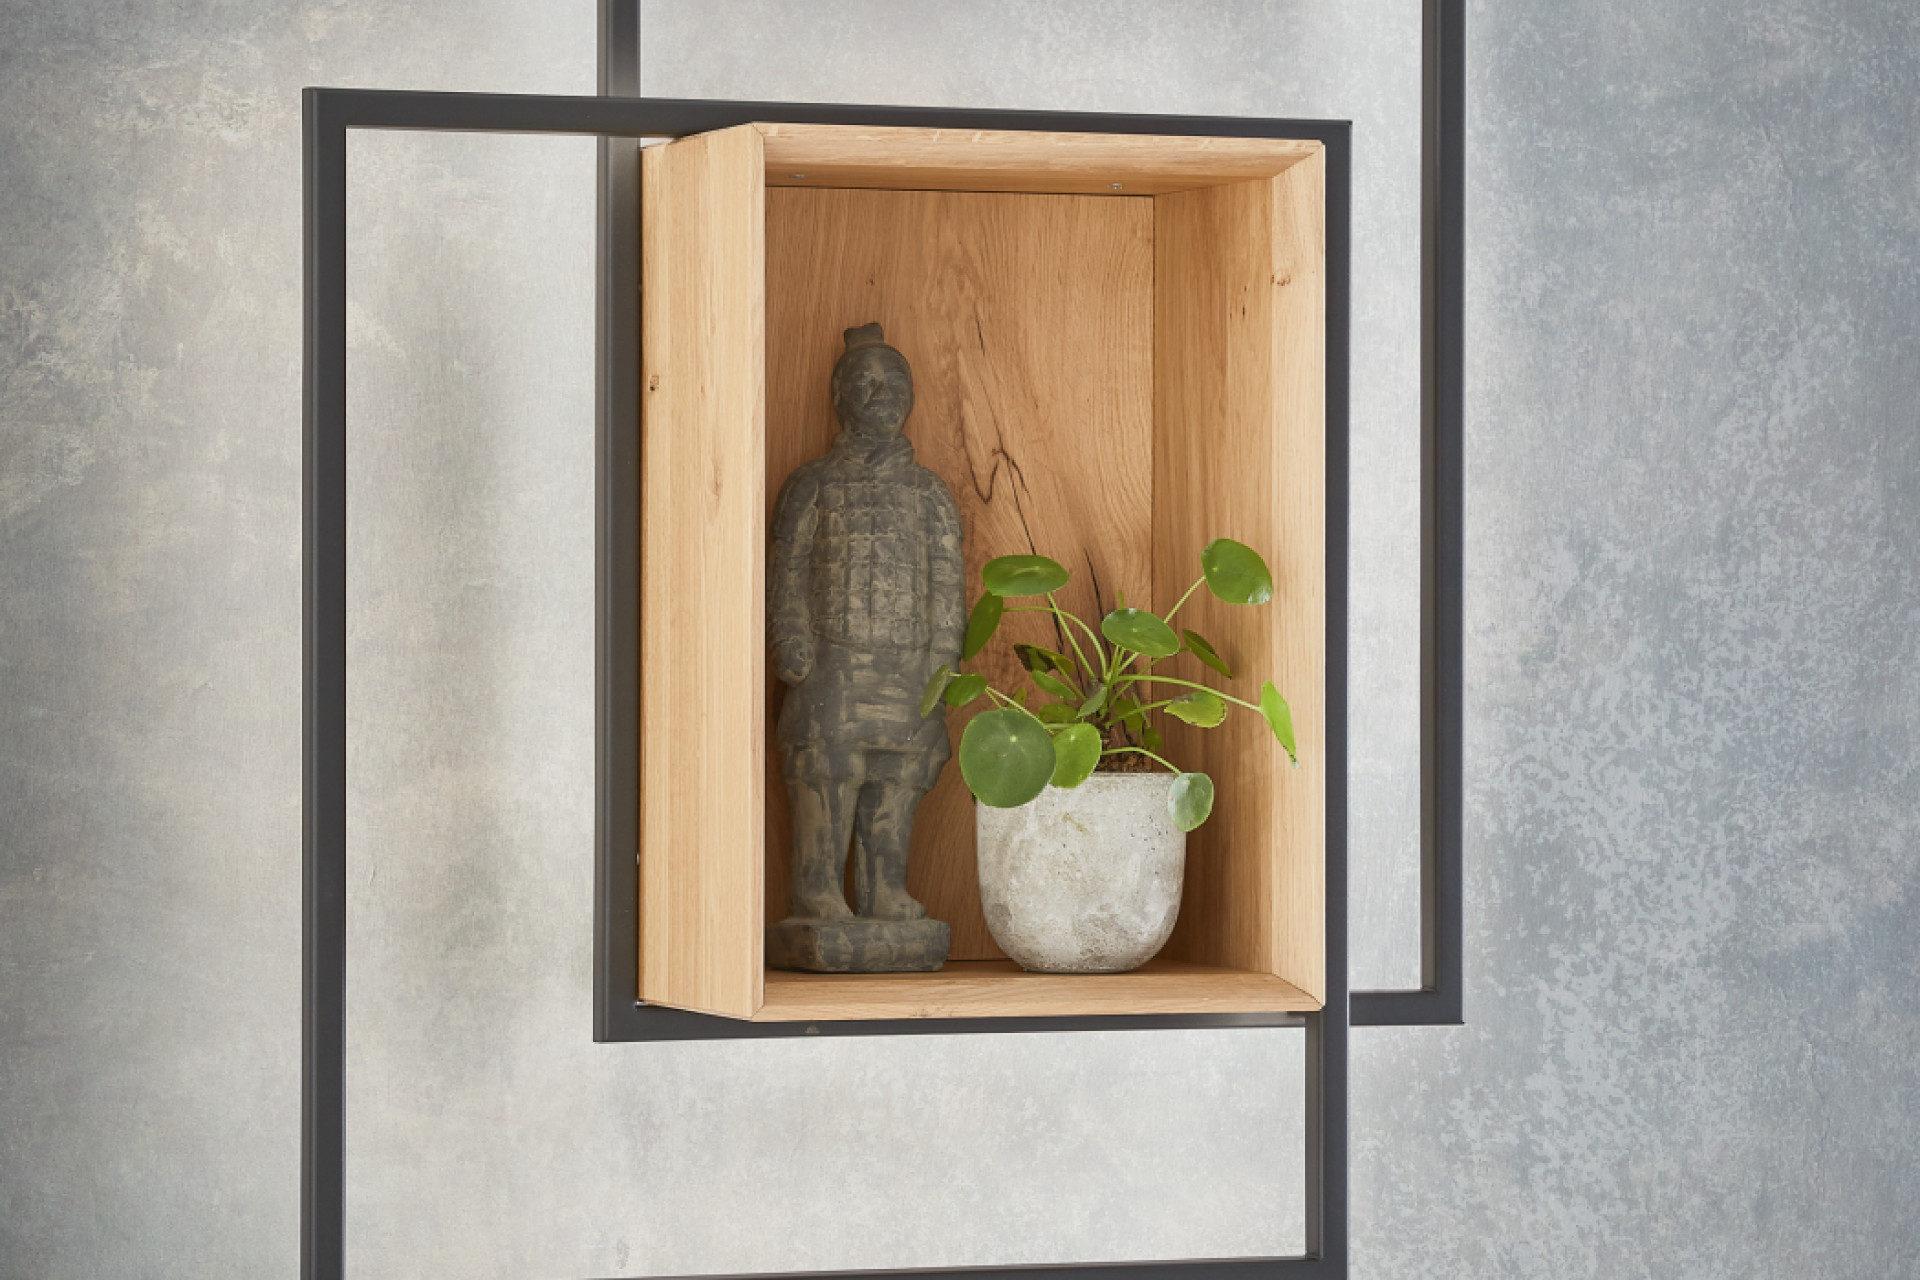 Wandregale Weiß Holz Metall Uvm Online Kaufen Xxxlutz